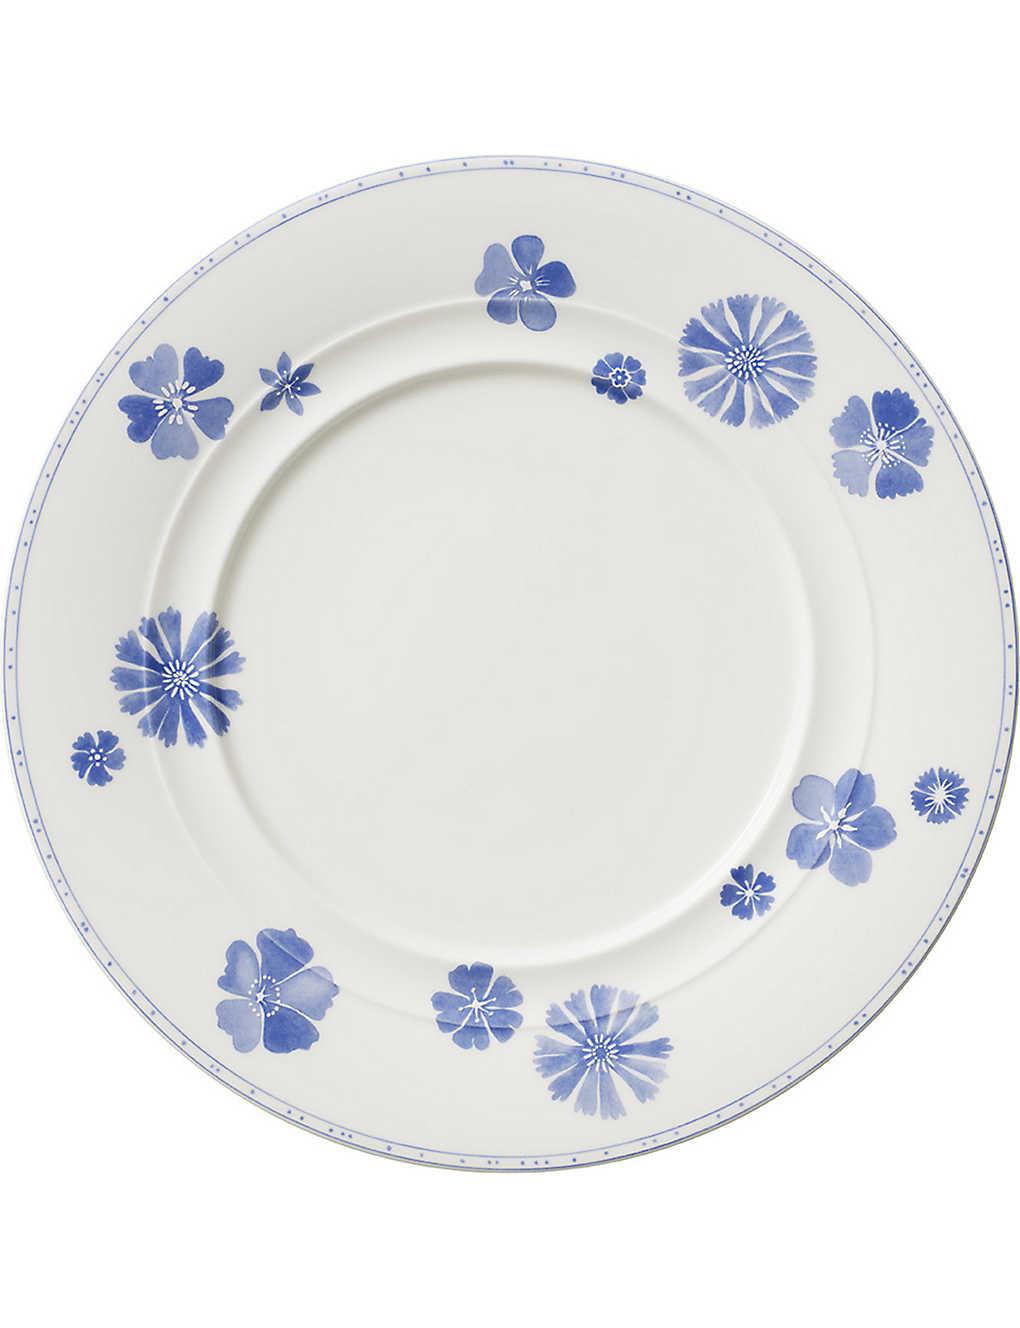 VILLEROY & BOCH - Farmhouse Touch Blueflowers dinner plate 28cm ...